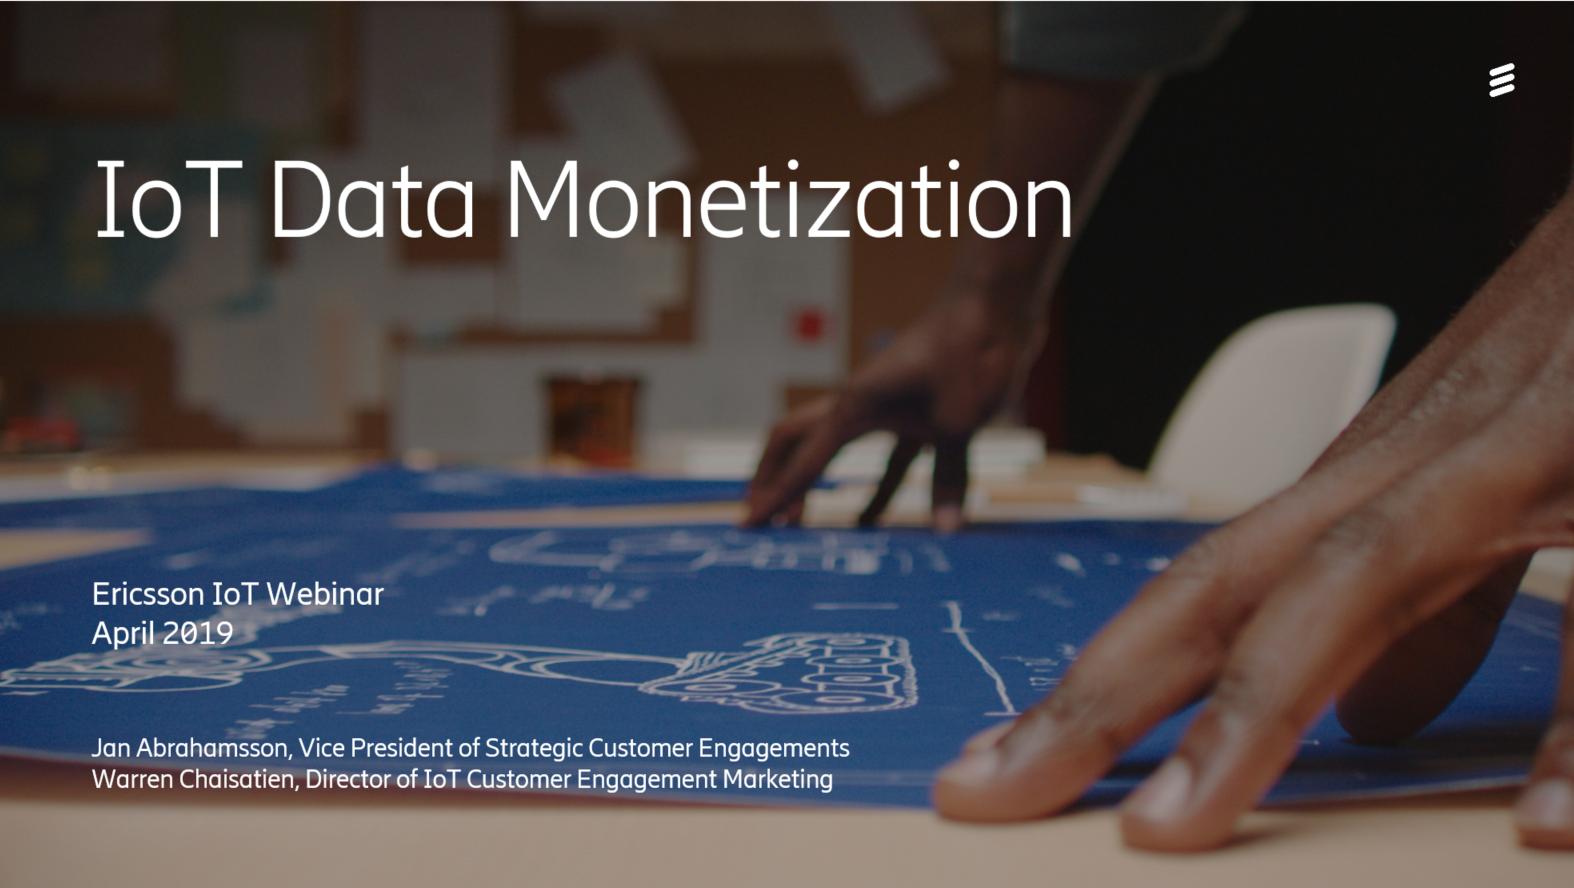 IoT Data Monetization